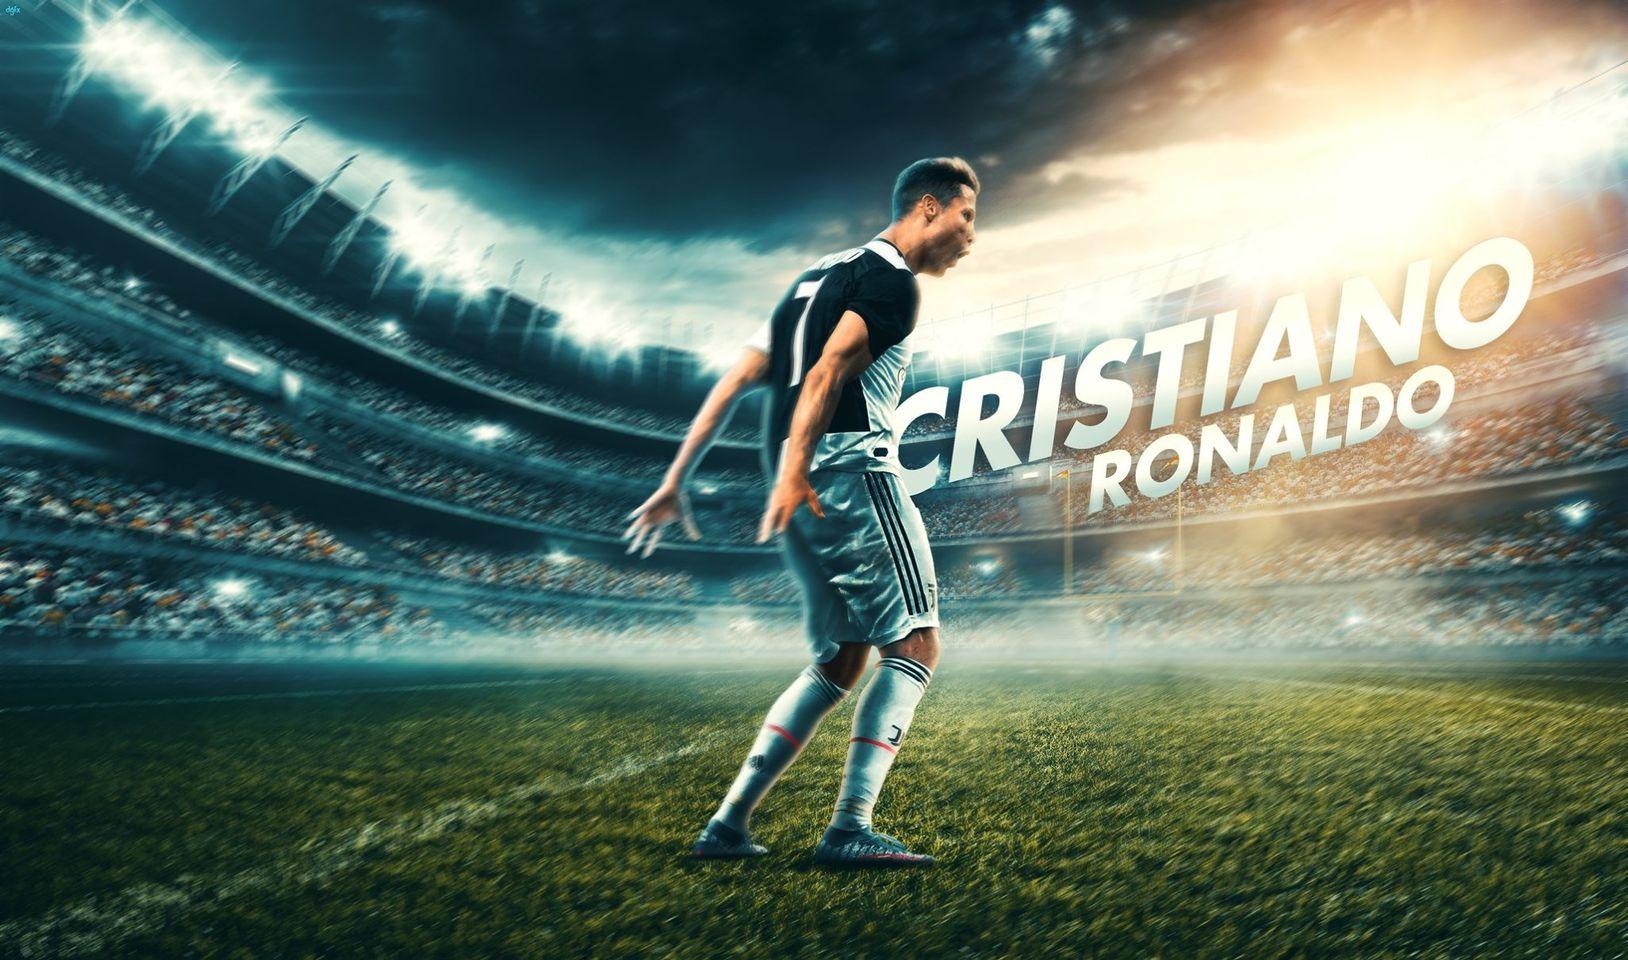 Cristiano Ronaldo Juventus Wallpaper PC Dekstop